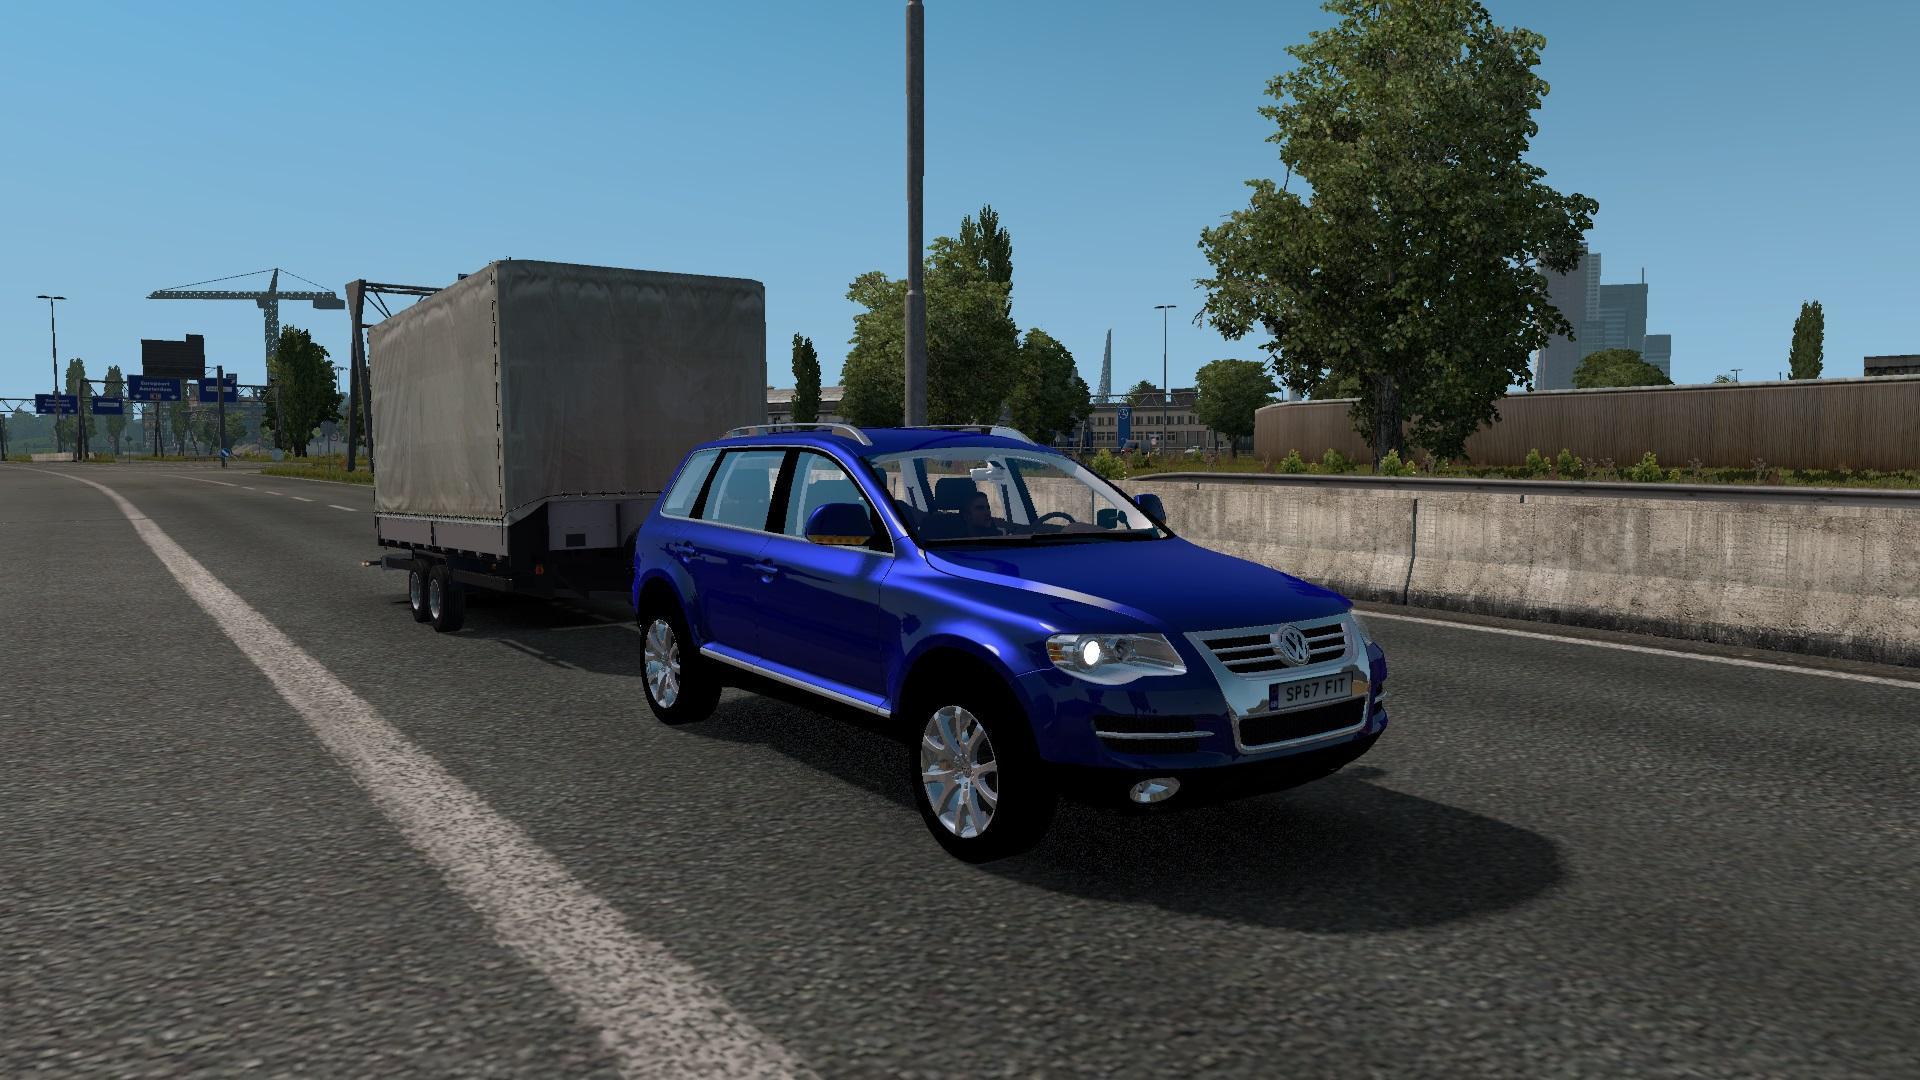 Volvo Truck Dealer >> VOLKSWAGEN TOUAREG V1.0 CAR MOD -Euro Truck Simulator 2 Mods